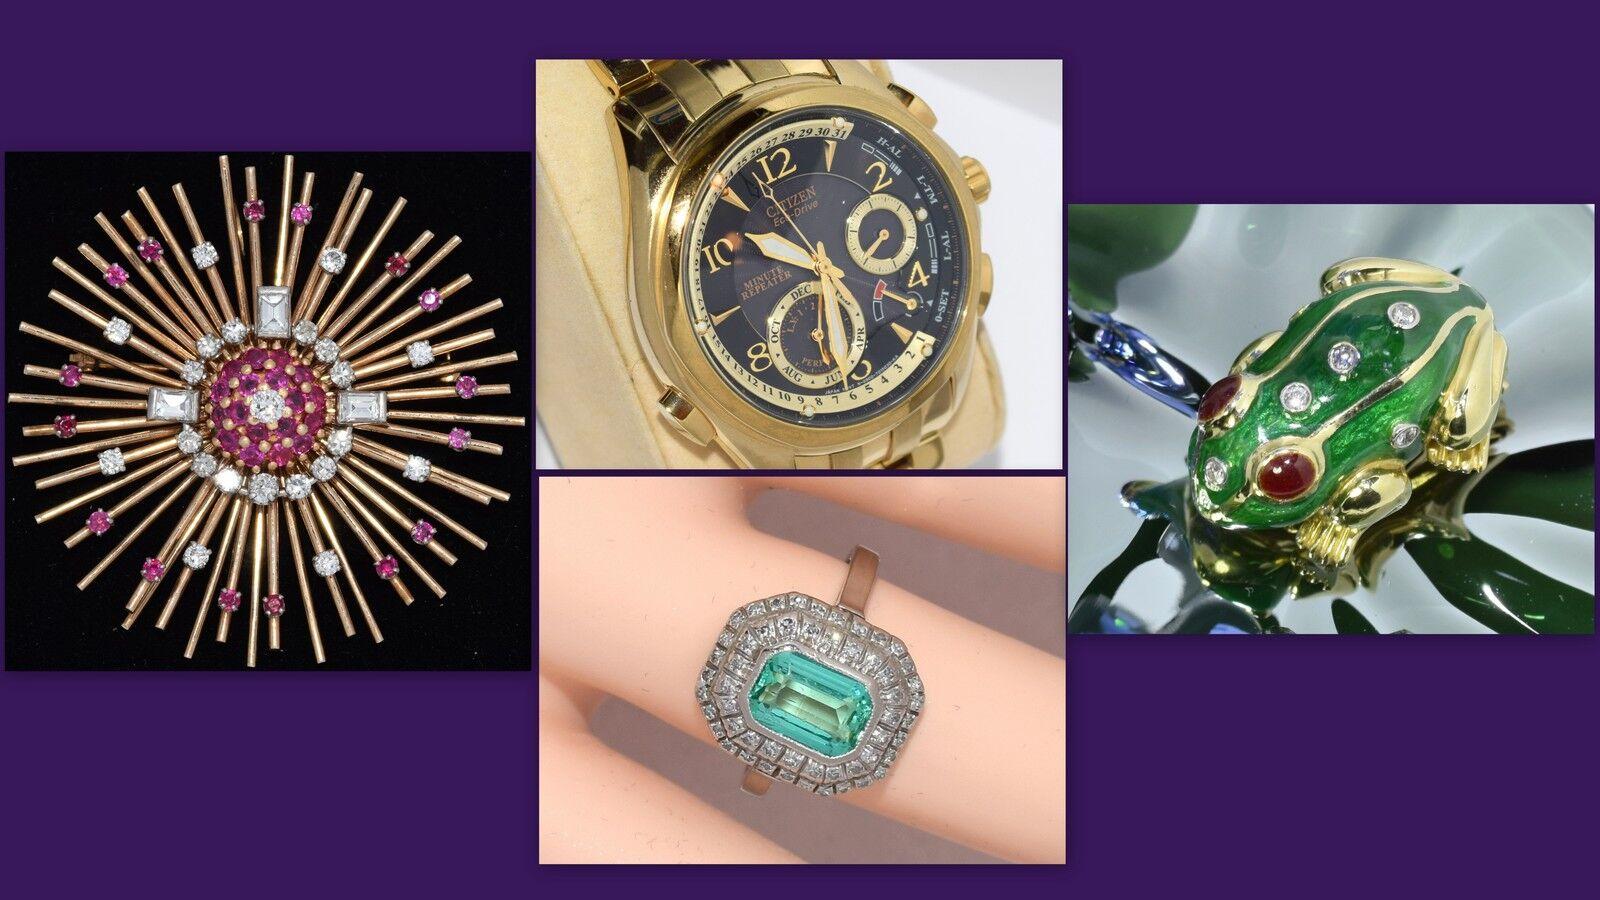 Ladydragyn's Gems and Jewelry